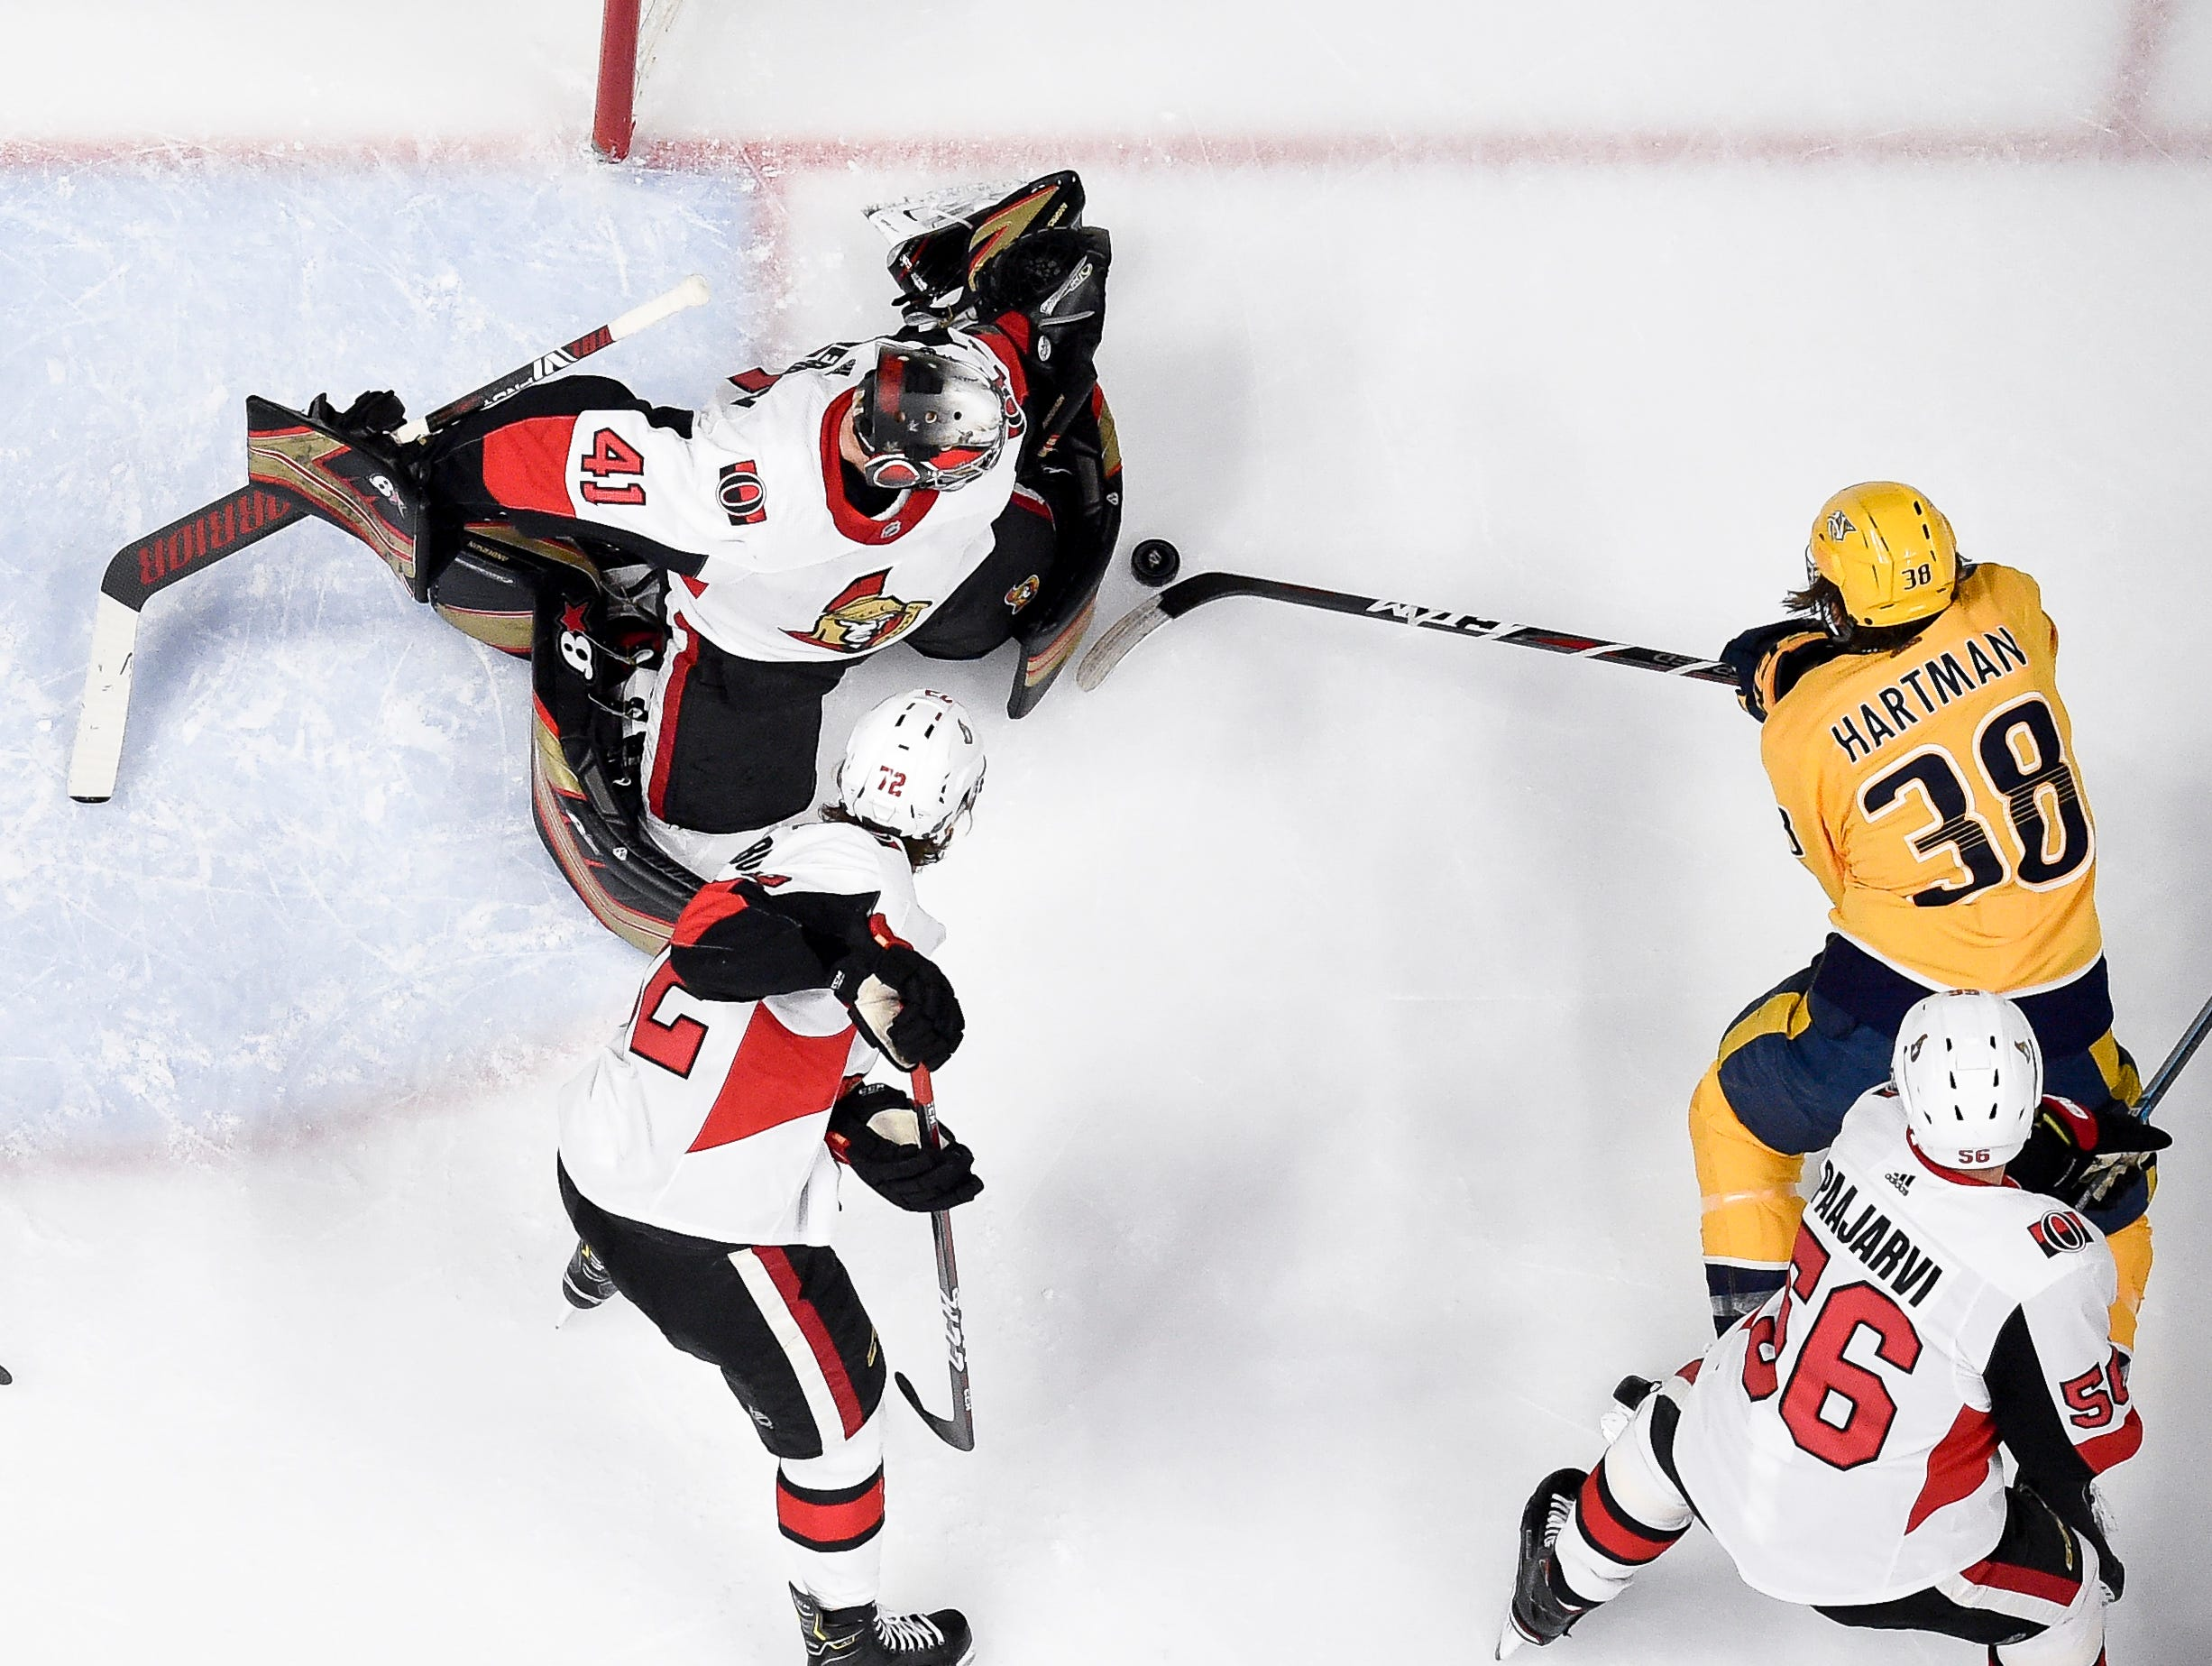 Ottawa Senators goaltender Craig Anderson (41) defends against Nashville Predators right wing Ryan Hartman (38) during the second period at Bridgestone Arena in Nashville, Tenn., Tuesday, Dec. 11, 2018.